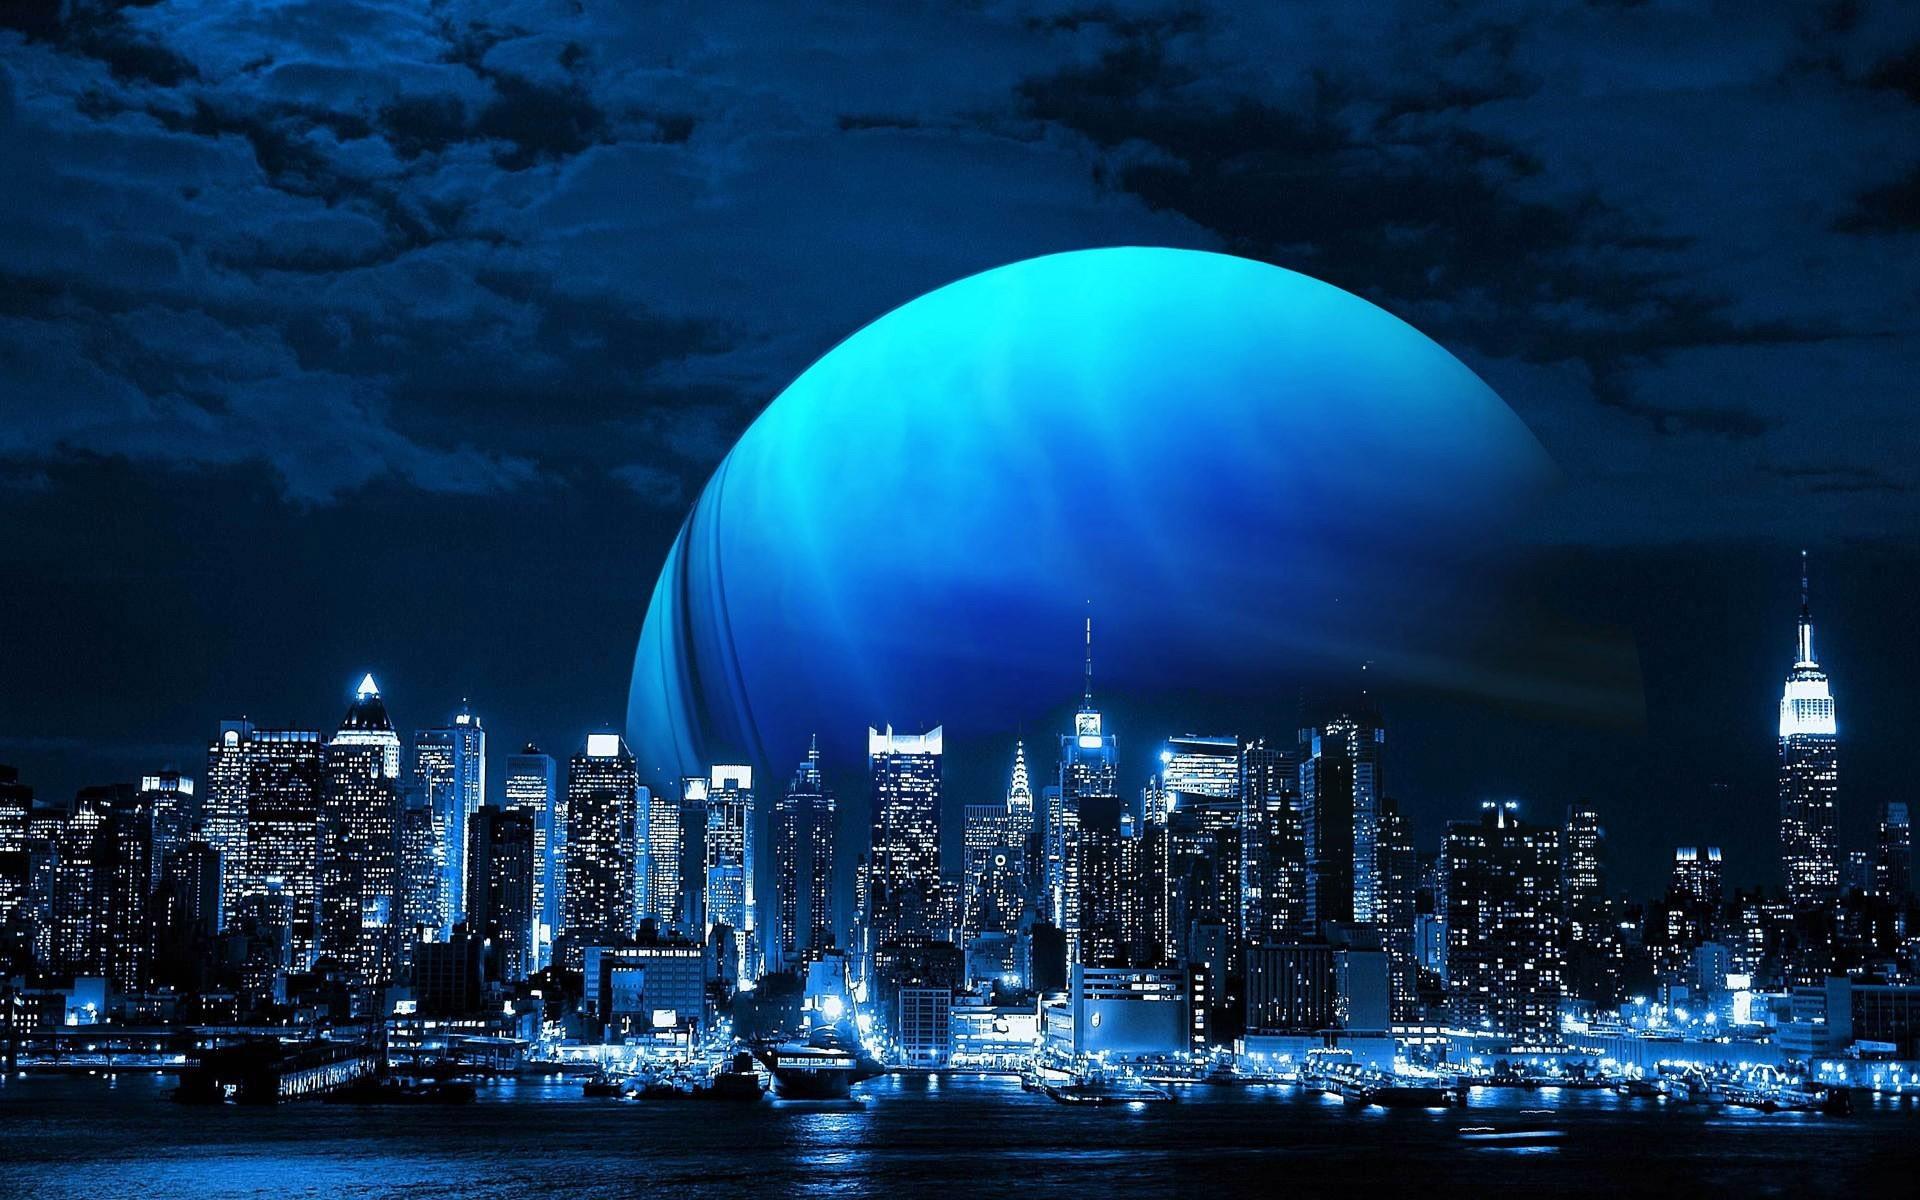 Fantasy – Moon Fantasy City Blue Planet Skyscraper Wallpaper